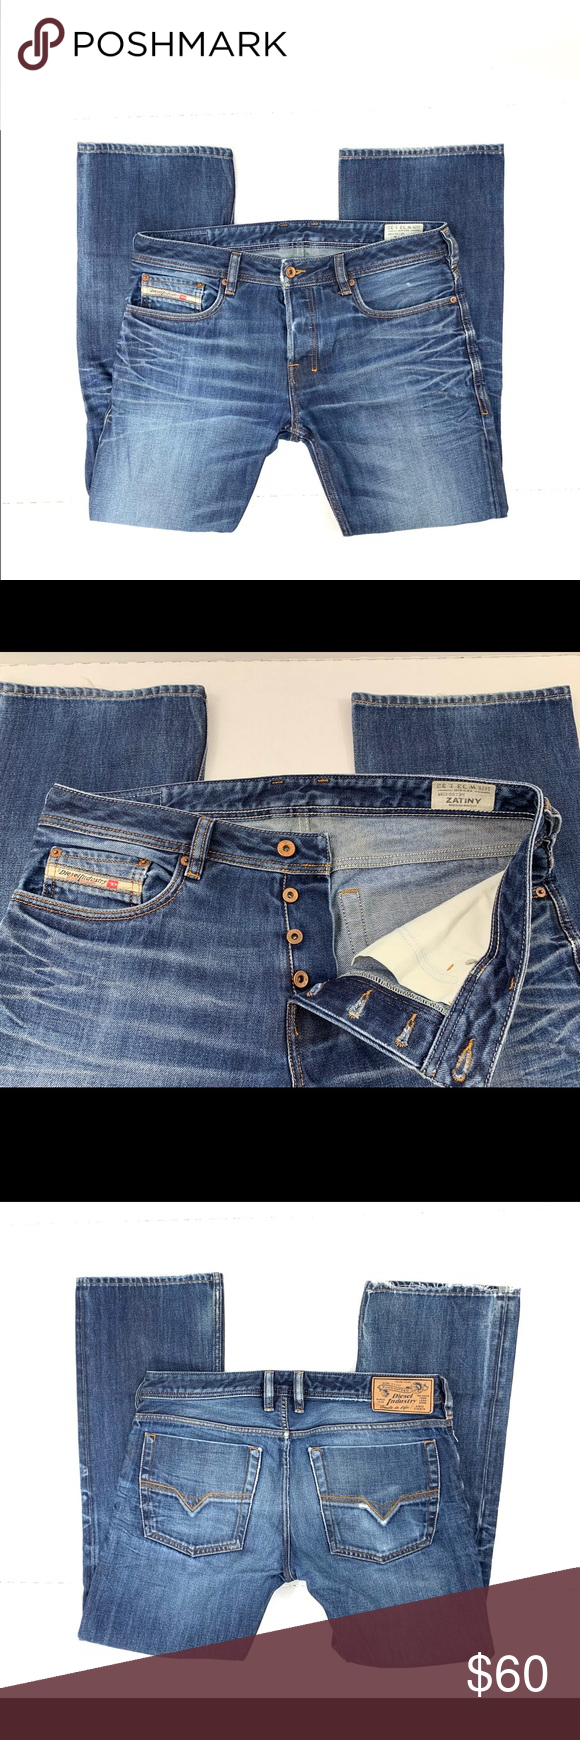 Diesel Zatiny Jeans Authentic Diesel Zatiny Men S Size 33x32 Wash 0073n Regular Bootcut Jeans 100 Cotton Waist 33 Insea Diesel Zatiny Diesel Jeans Jeans